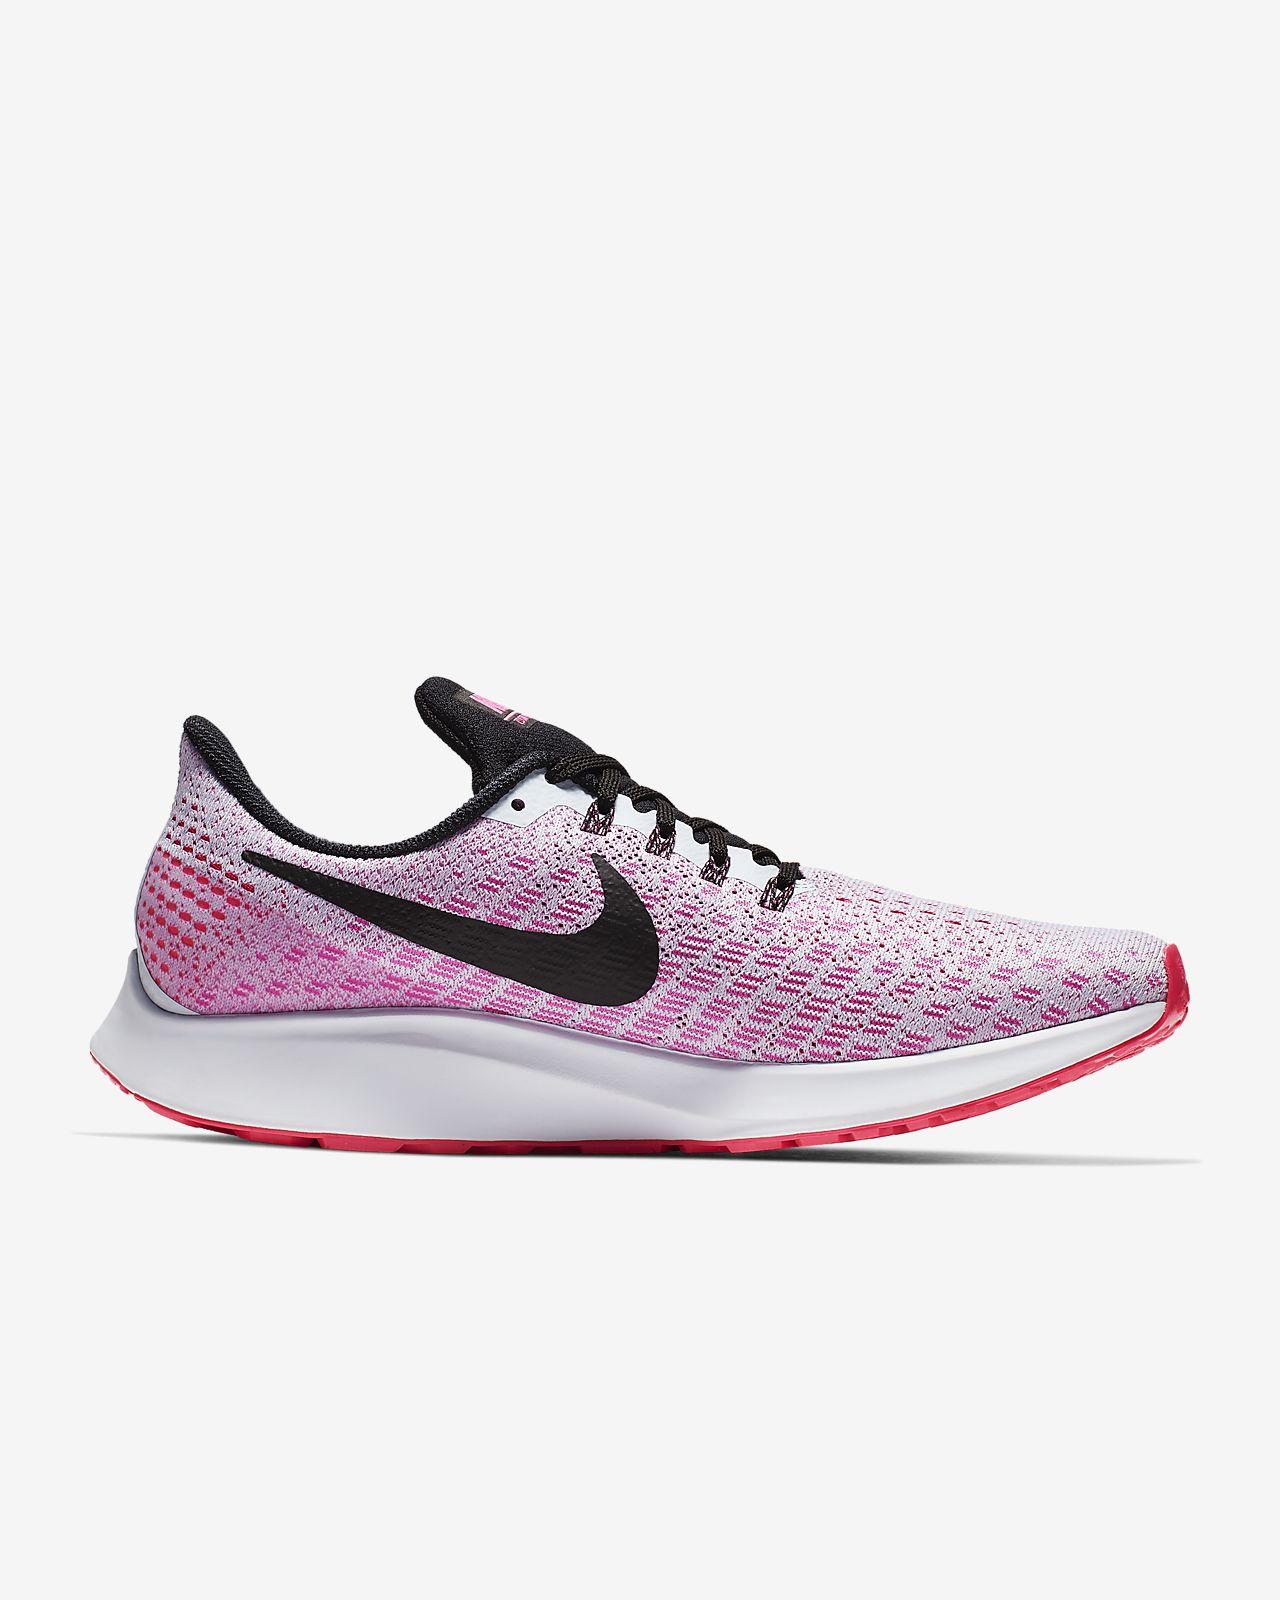 buy online b6aa1 1a916 ... Nike Air Zoom Pegasus 35 Damen-Laufschuh